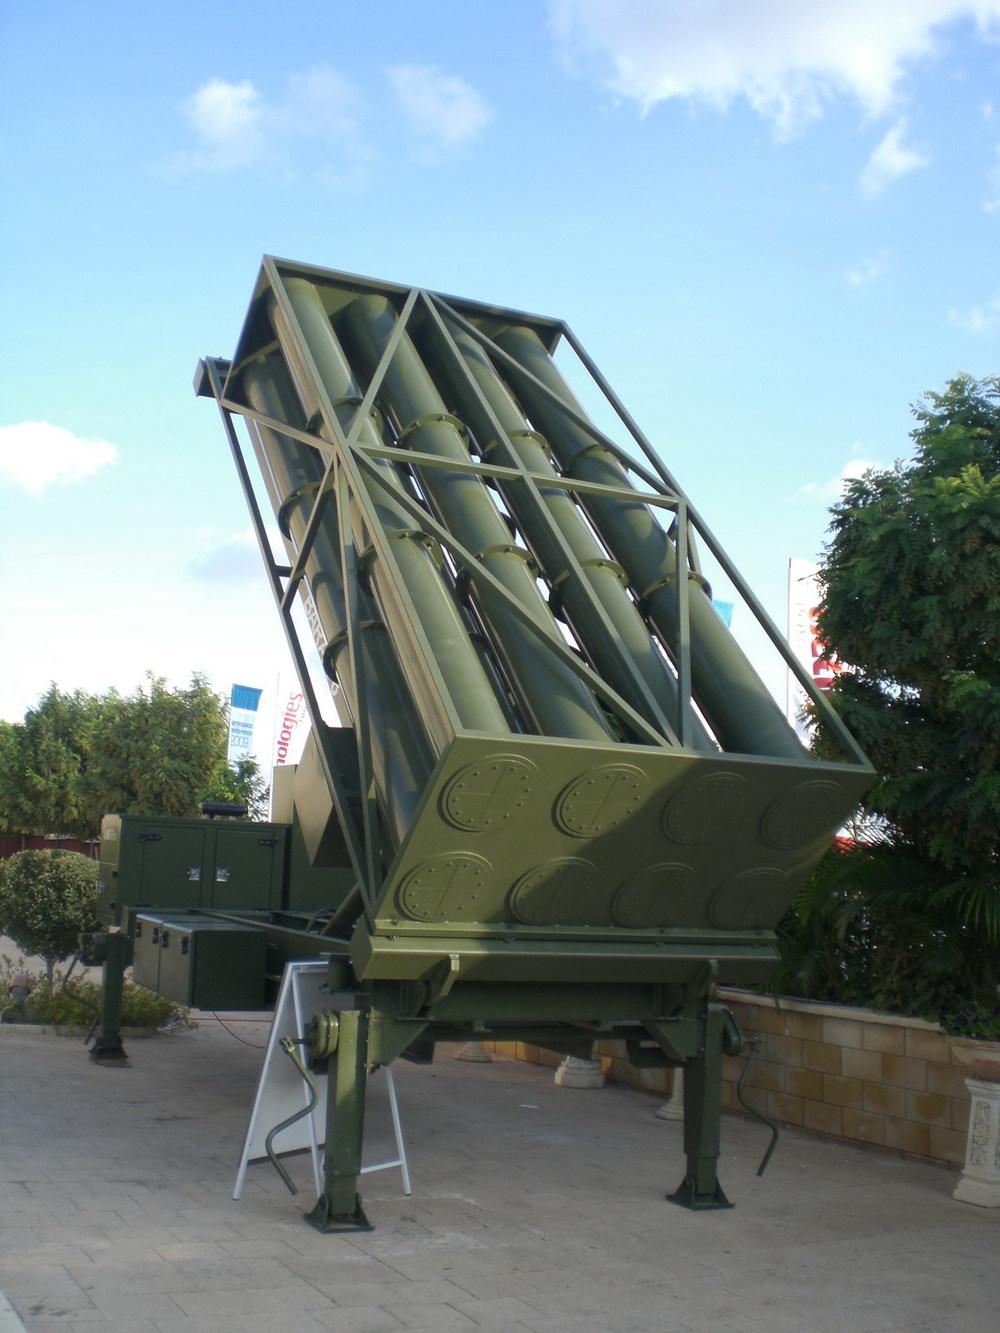 IAI's Barak-8 missile launcher. Credit: Wikimedia Commons.